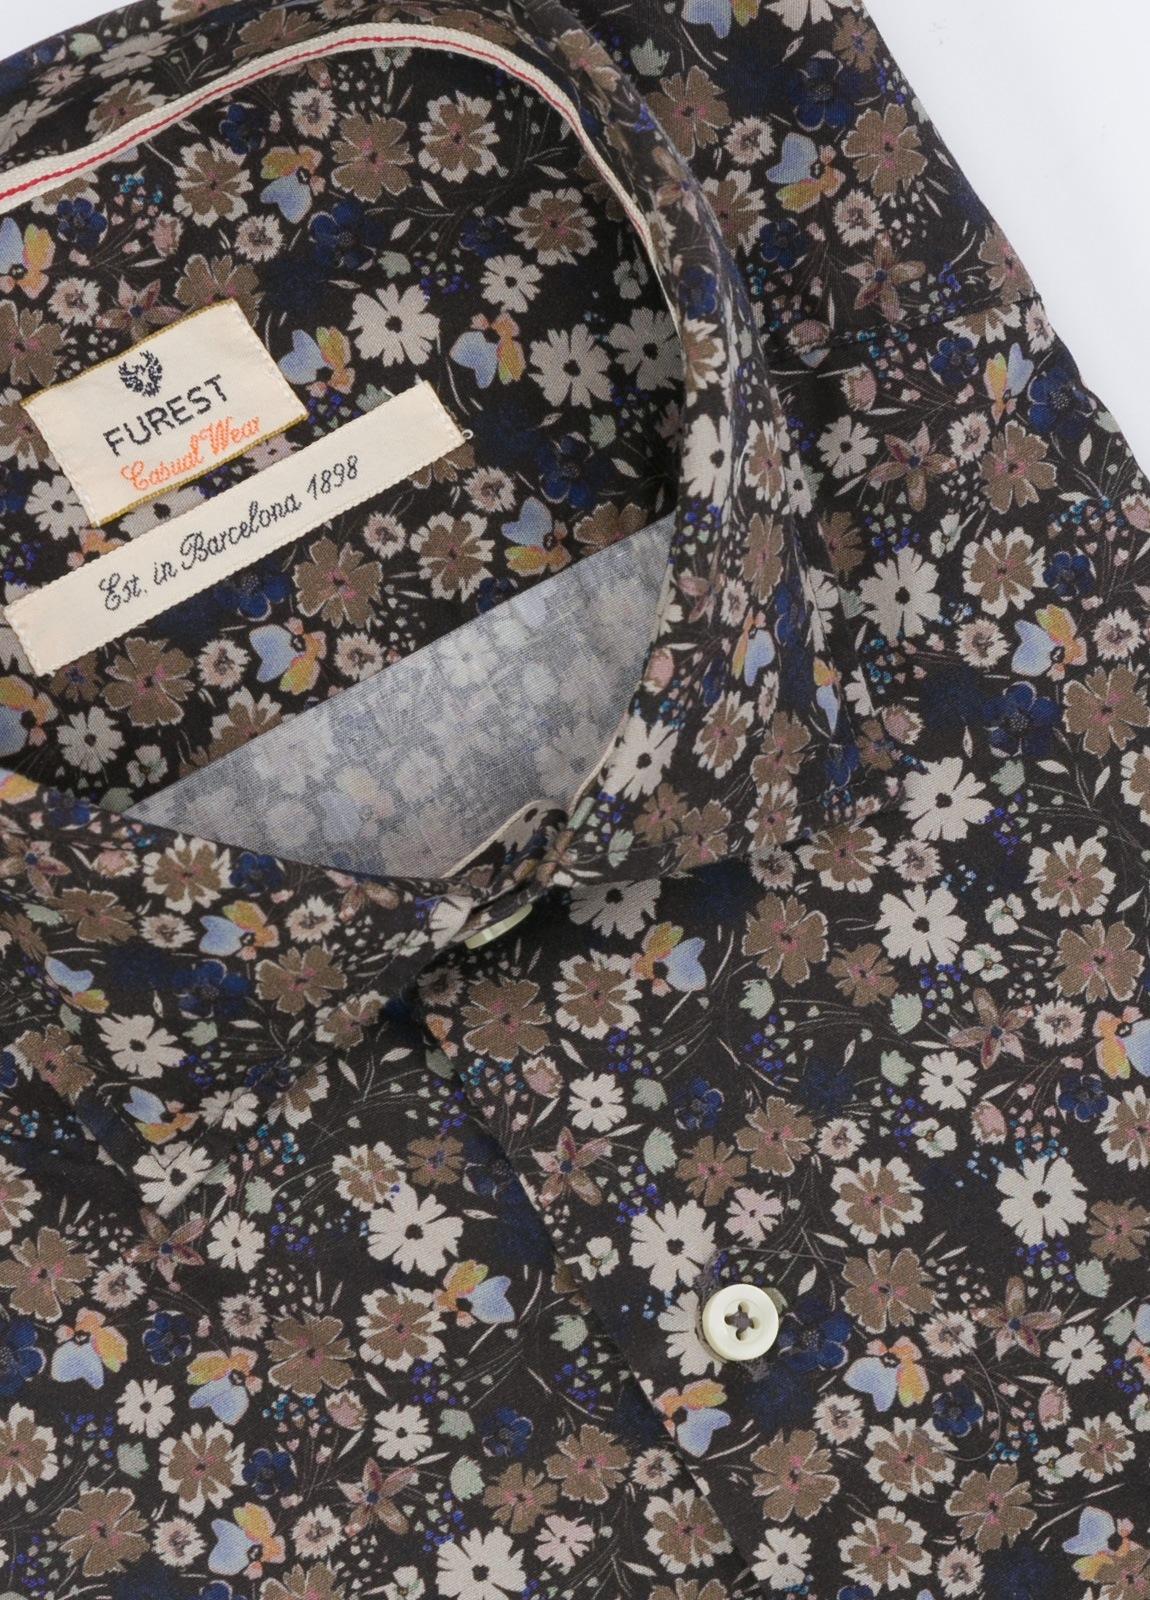 Camisa Leisure Wear SLIM FIT , modelo PORTO estampado floral color azul . 100% Algodón. - Ítem1